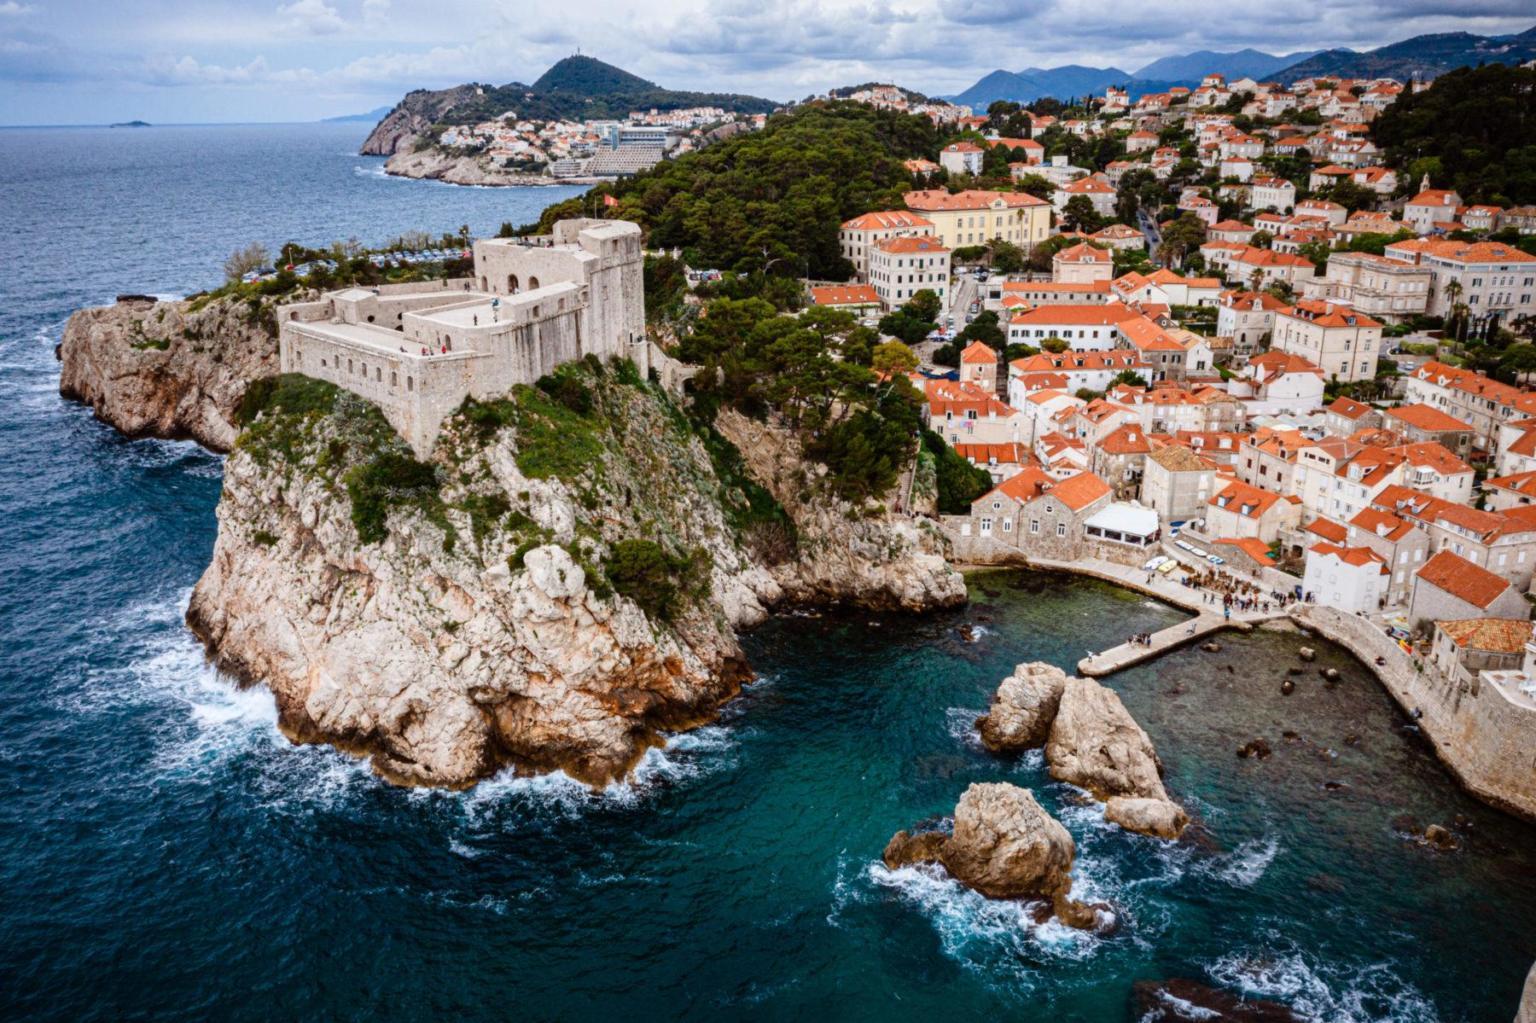 DJI 0046 scaled - Game of Thrones Hochzeit in Kroatien